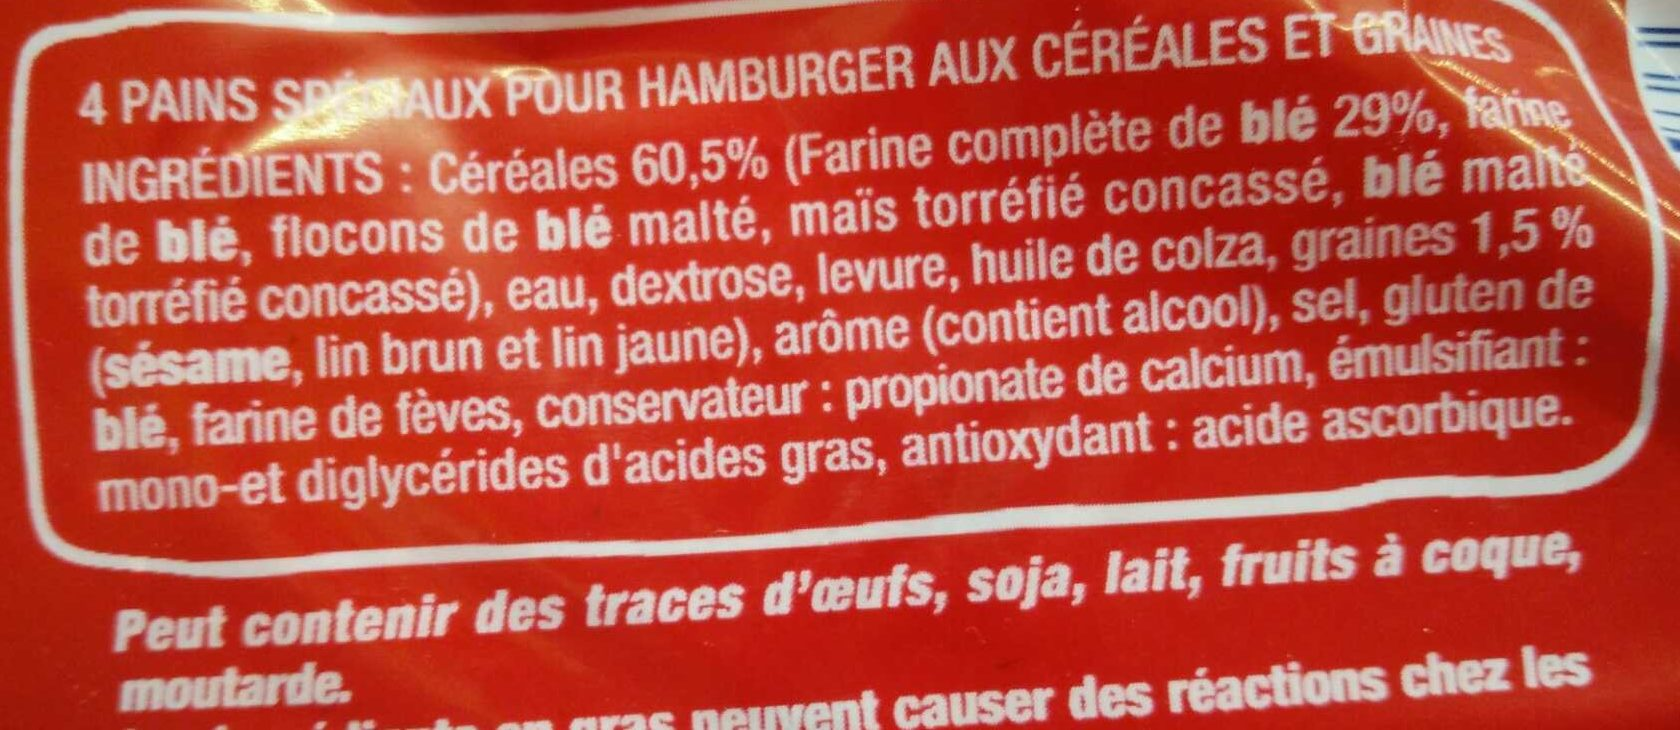 Burger céréales et graines - Ingrediënten - fr